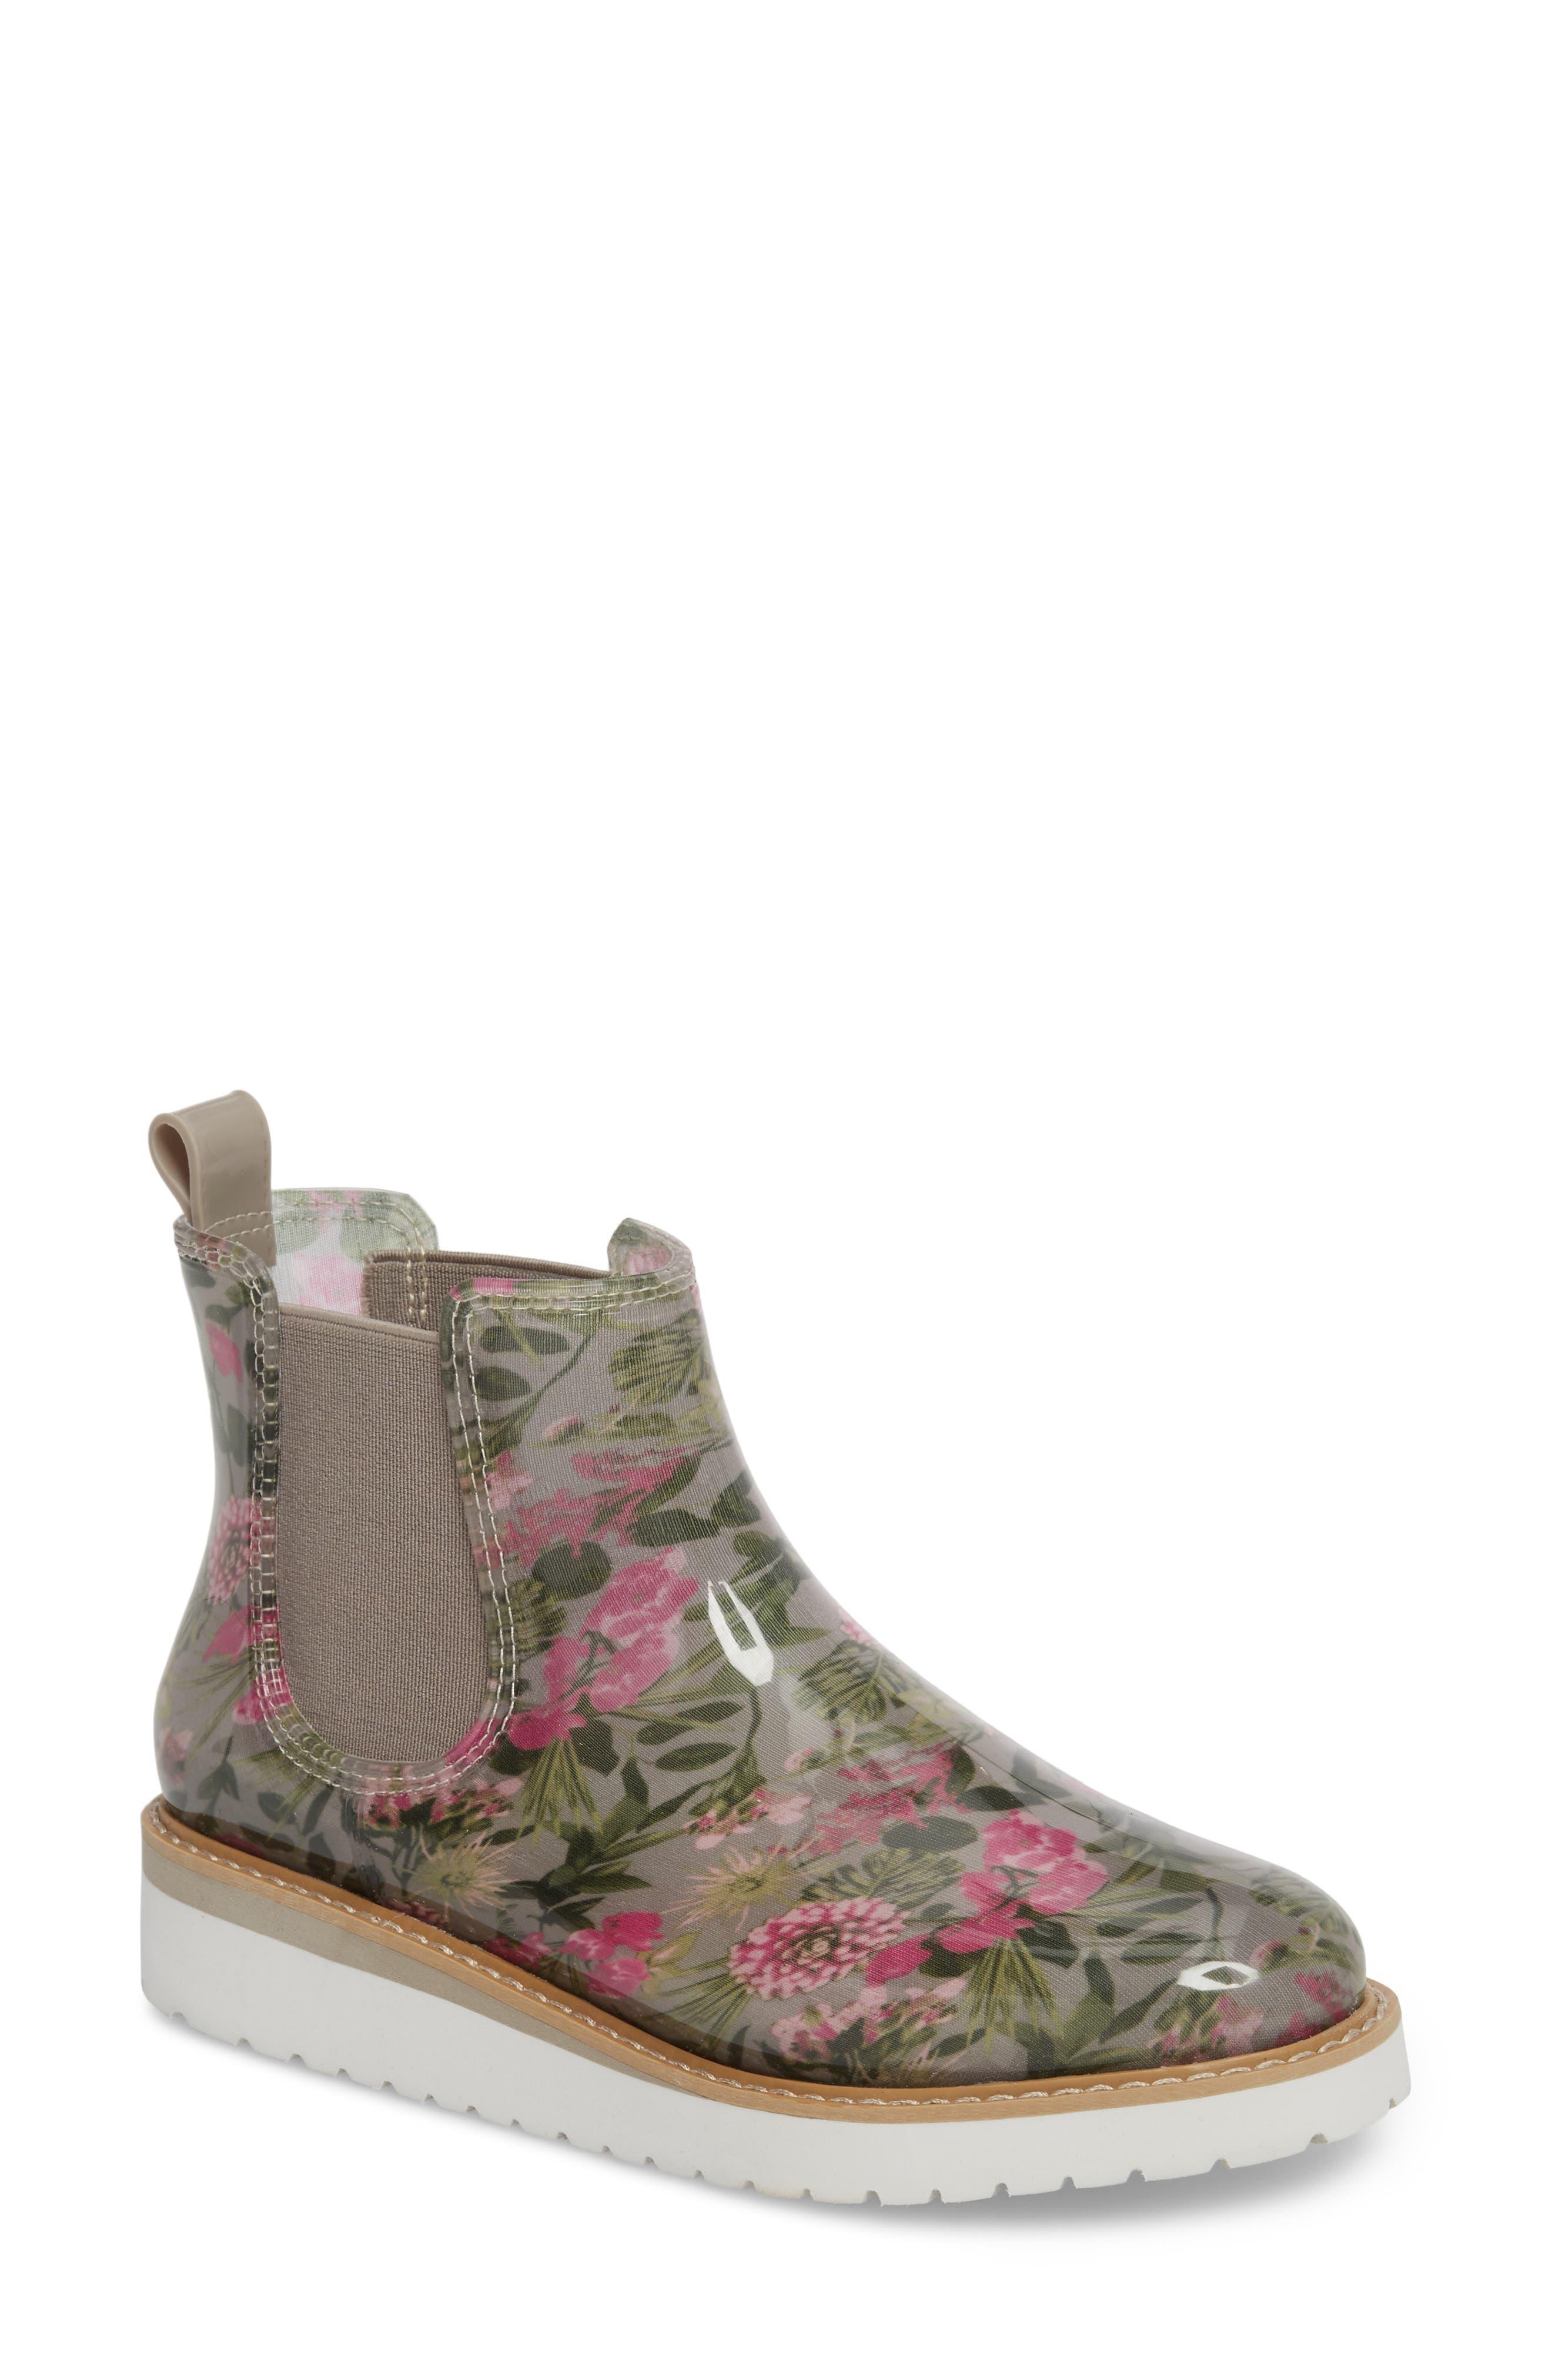 Cougar Kensington Chelsea Rain Boot (Women)